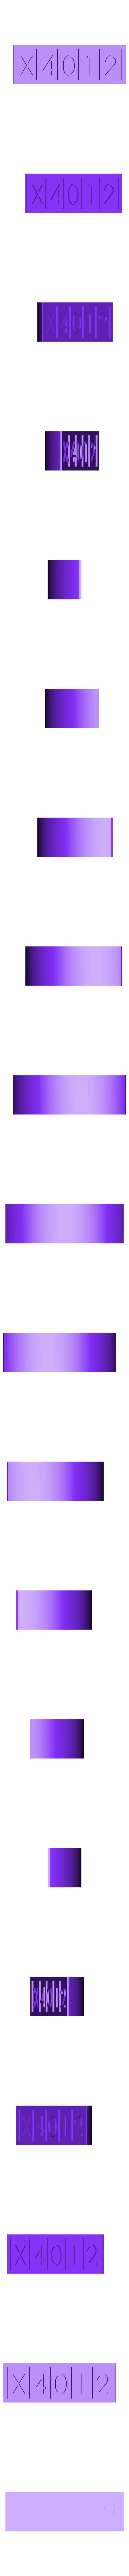 Indicator_Lamp.STL Download free STL file 4-8-8-4 Big Boy Locomotive • 3D printer object, RaymondDeLuca